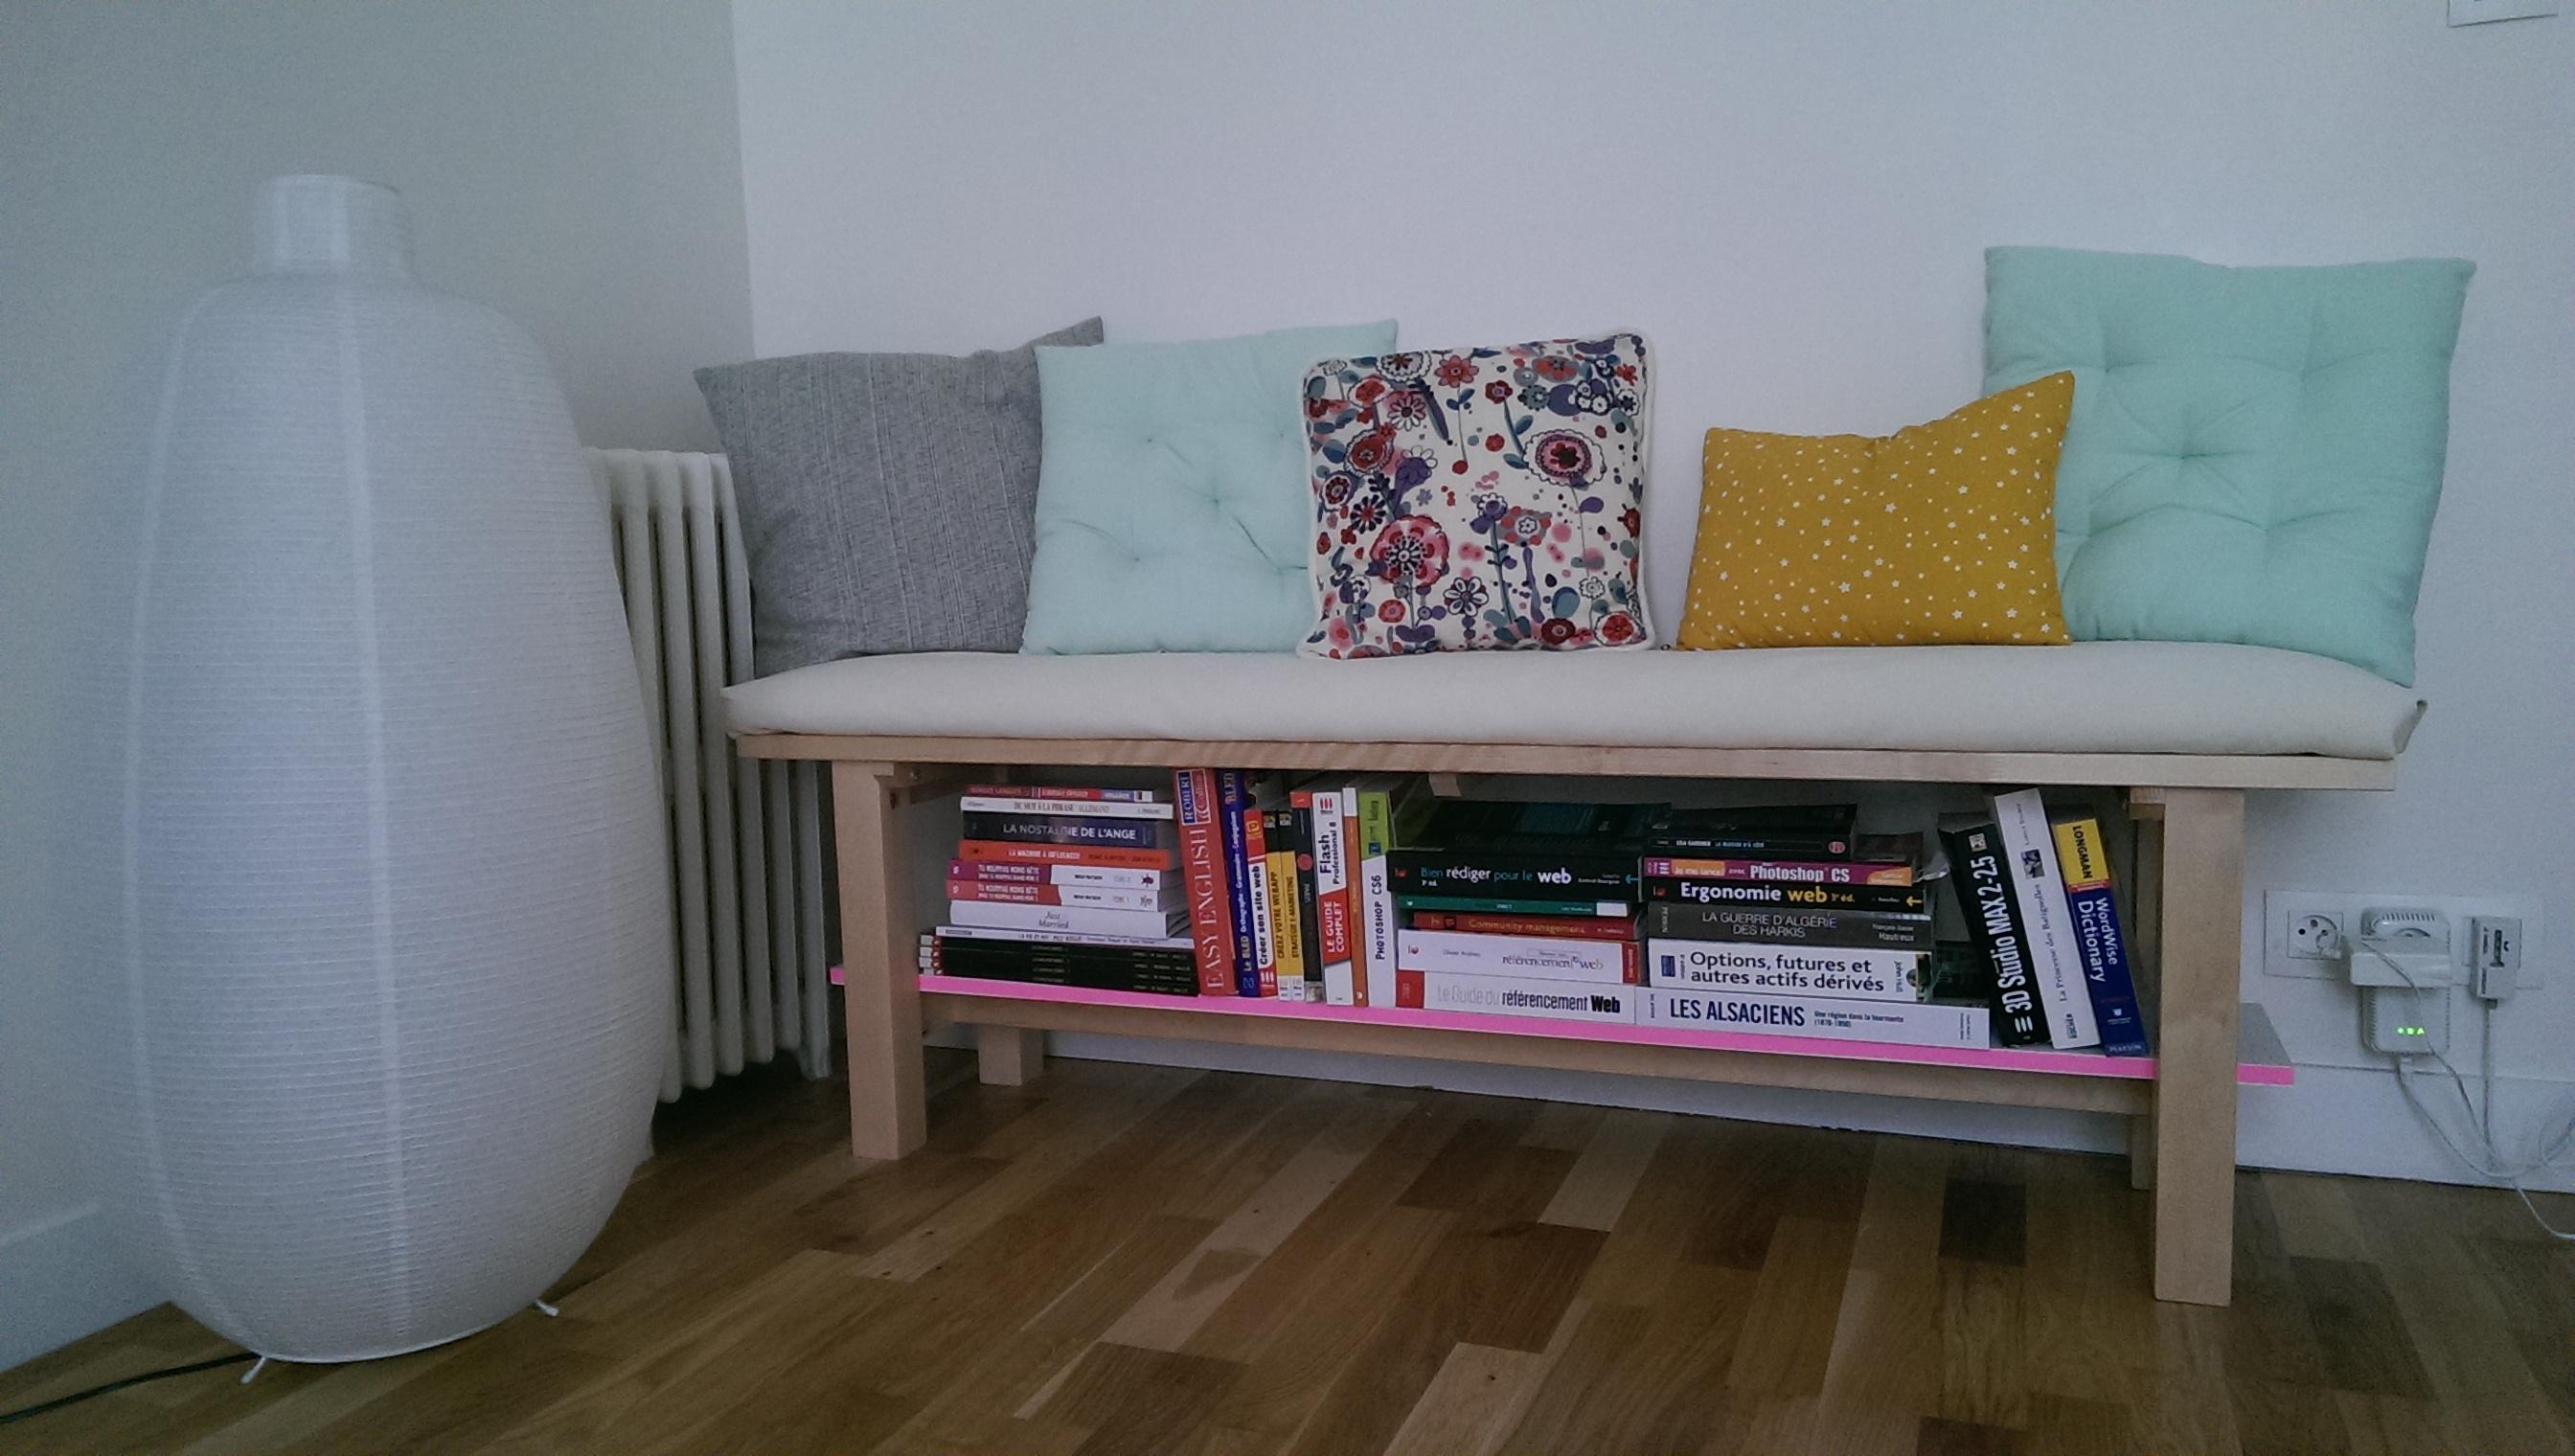 cr er sa propre banquette c est possible a blog pourpoint. Black Bedroom Furniture Sets. Home Design Ideas